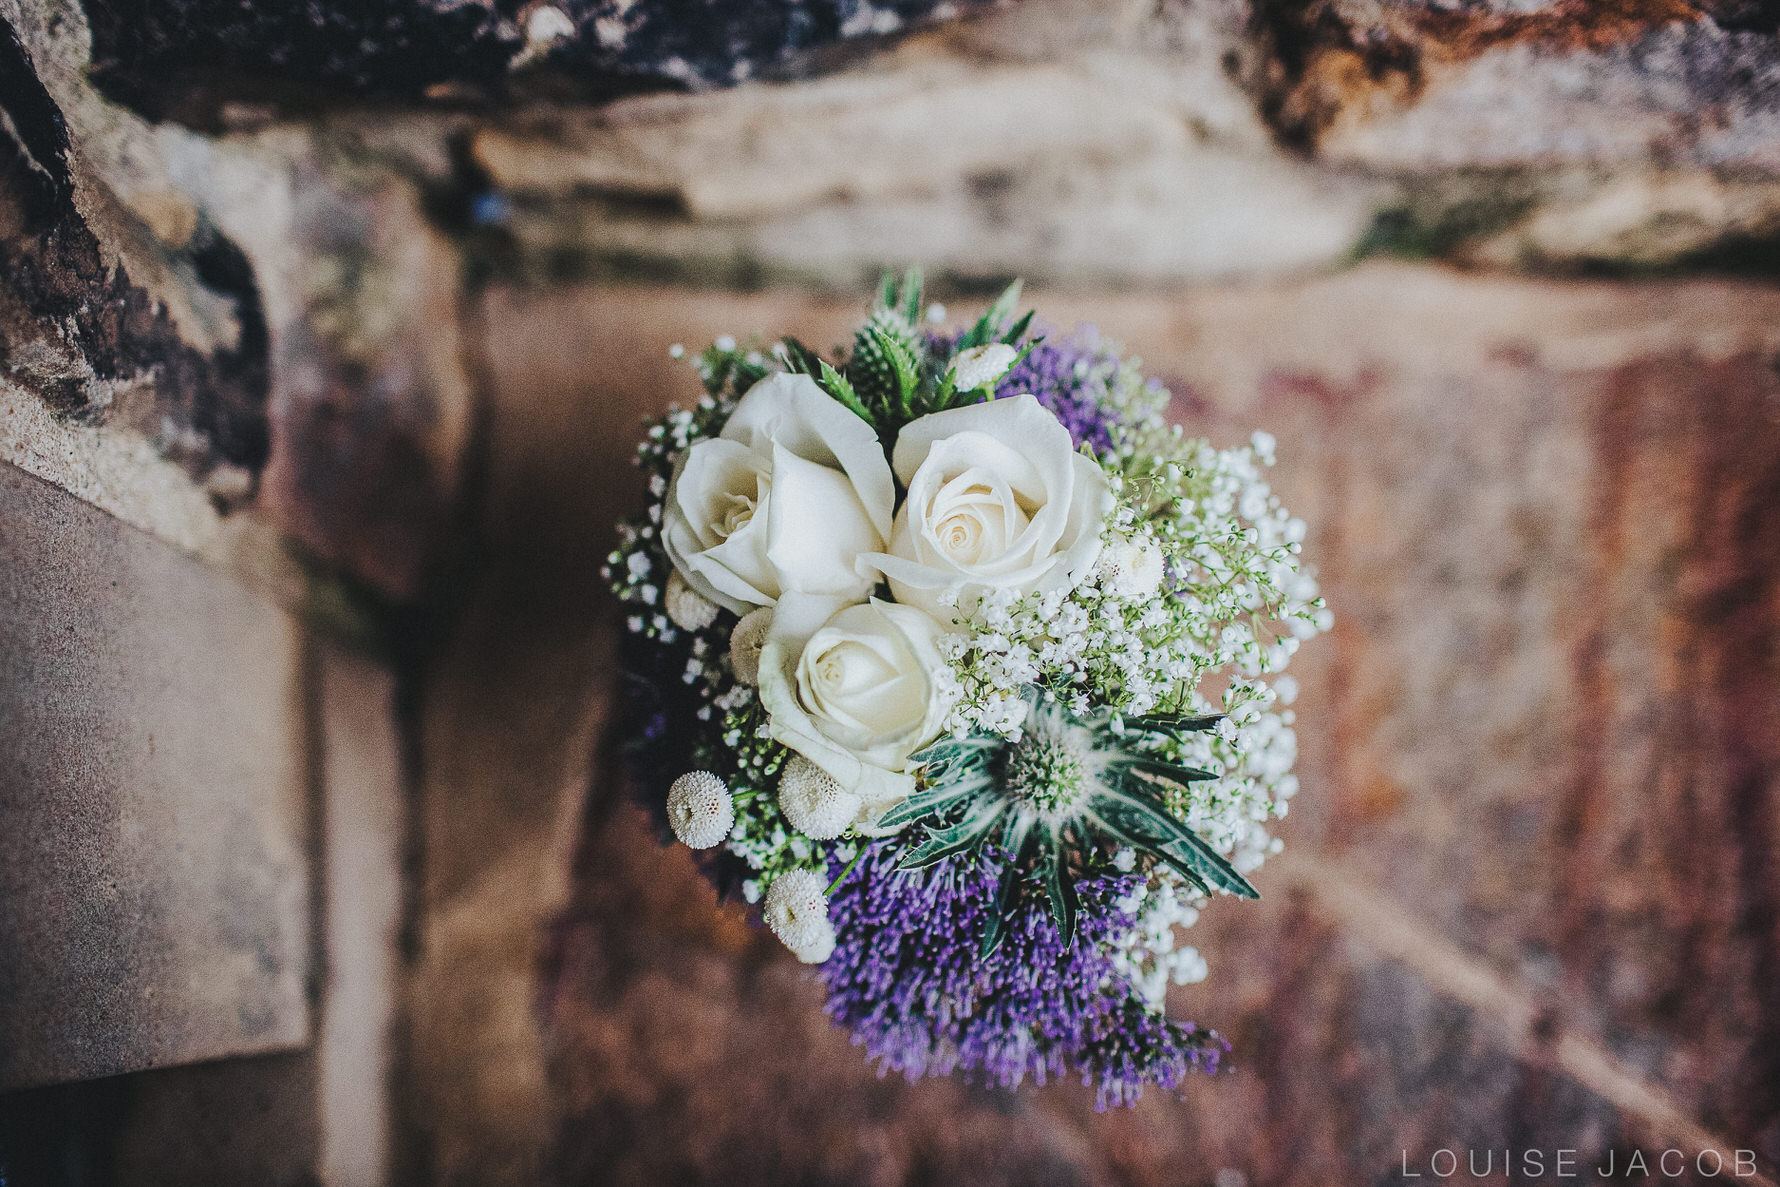 Documentary Wedding Photography - Bridal bouquet